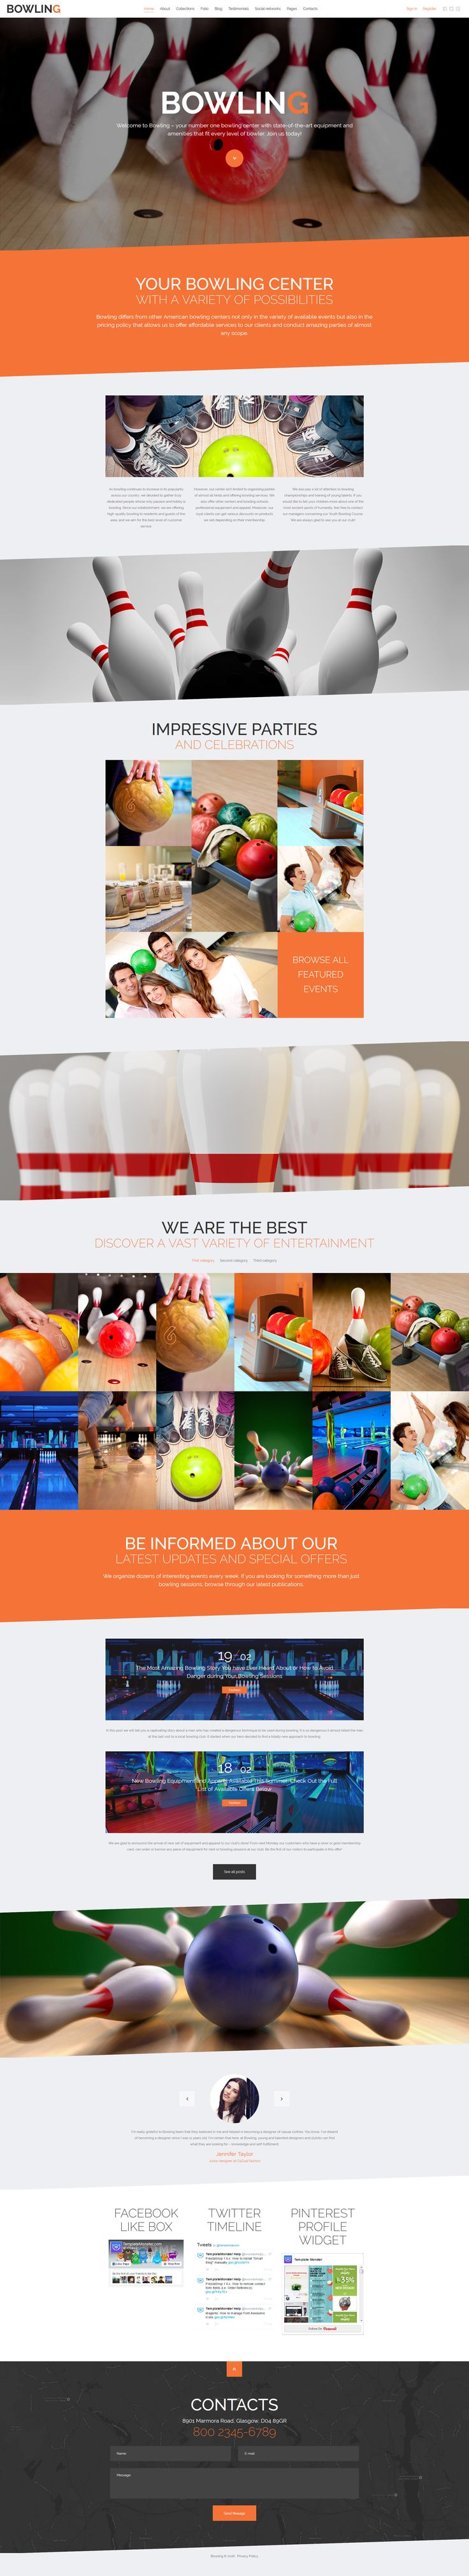 Bowling Joomla Template -  http://www.templatemonster.com/joomla-templates/bowling-joomla-template-60034.html